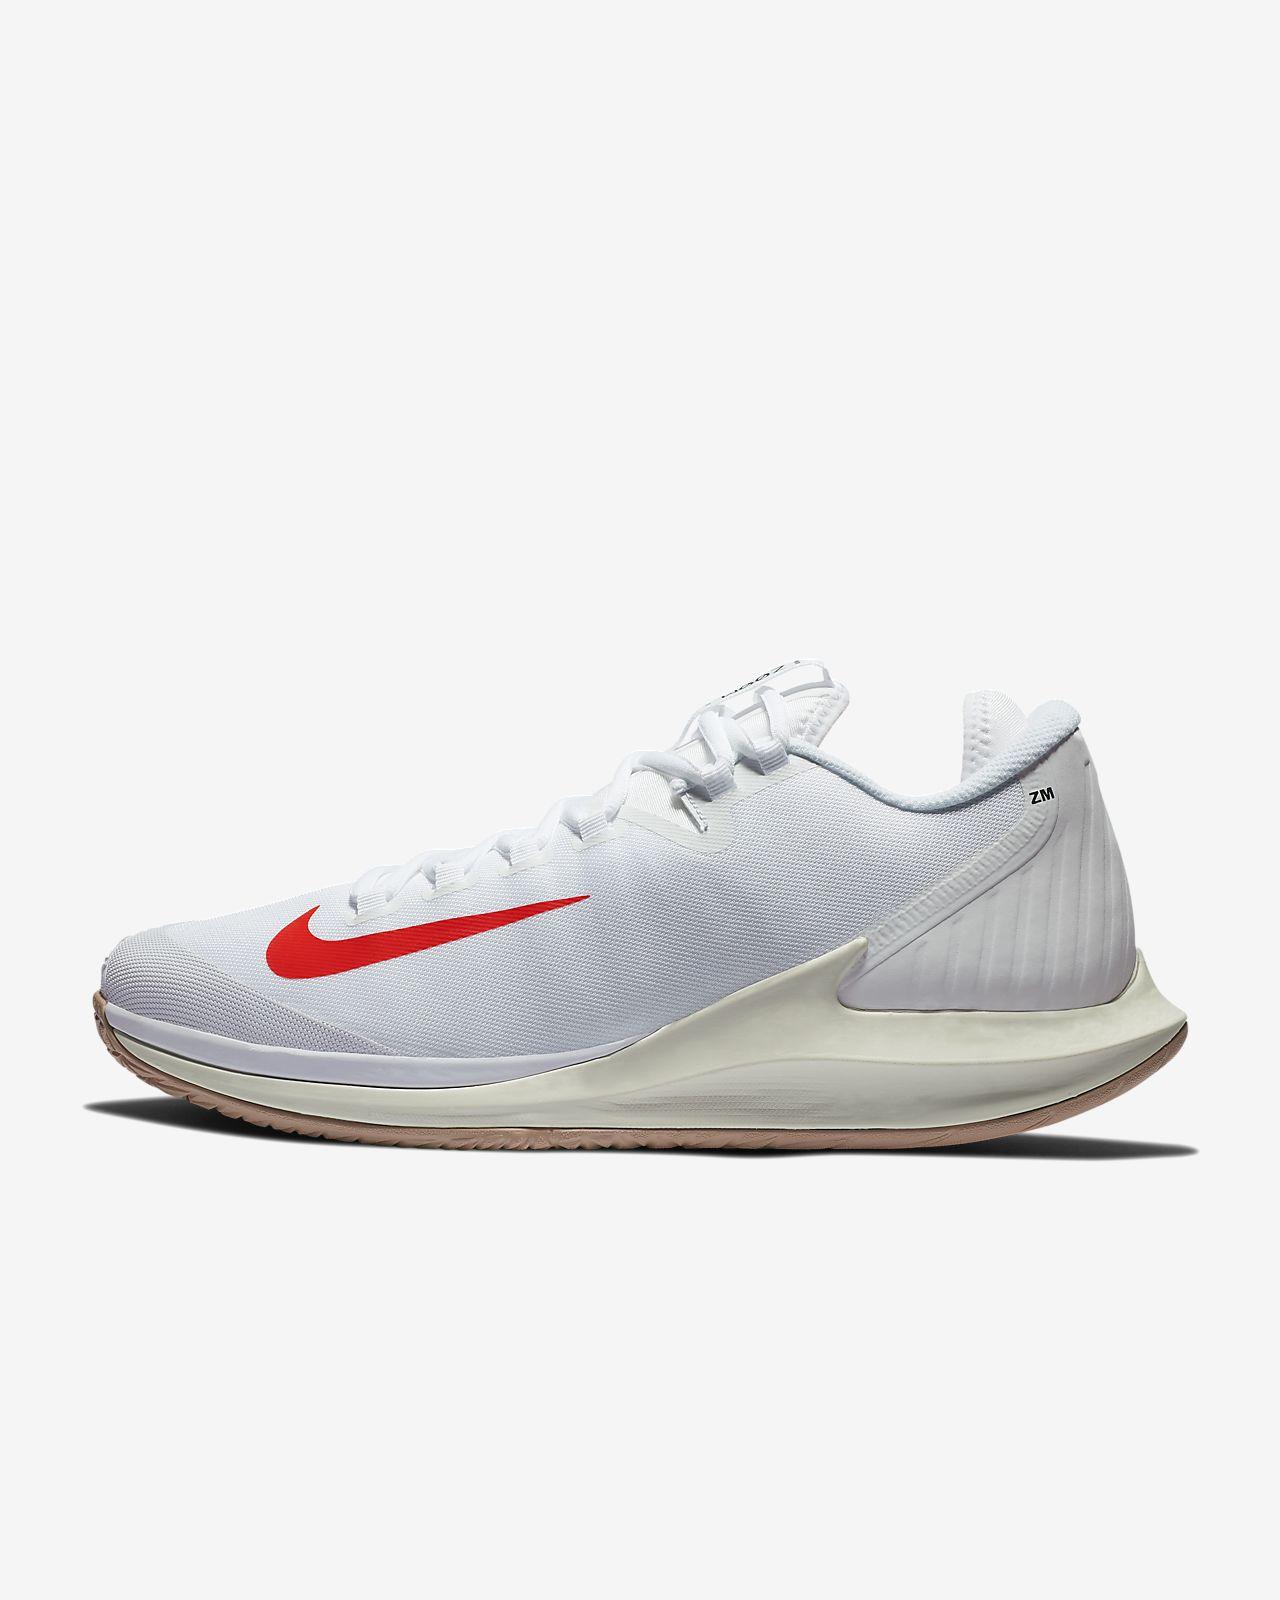 203d9fe18120 NikeCourt Air Zoom Zero Men s Tennis Shoe. Nike.com RO